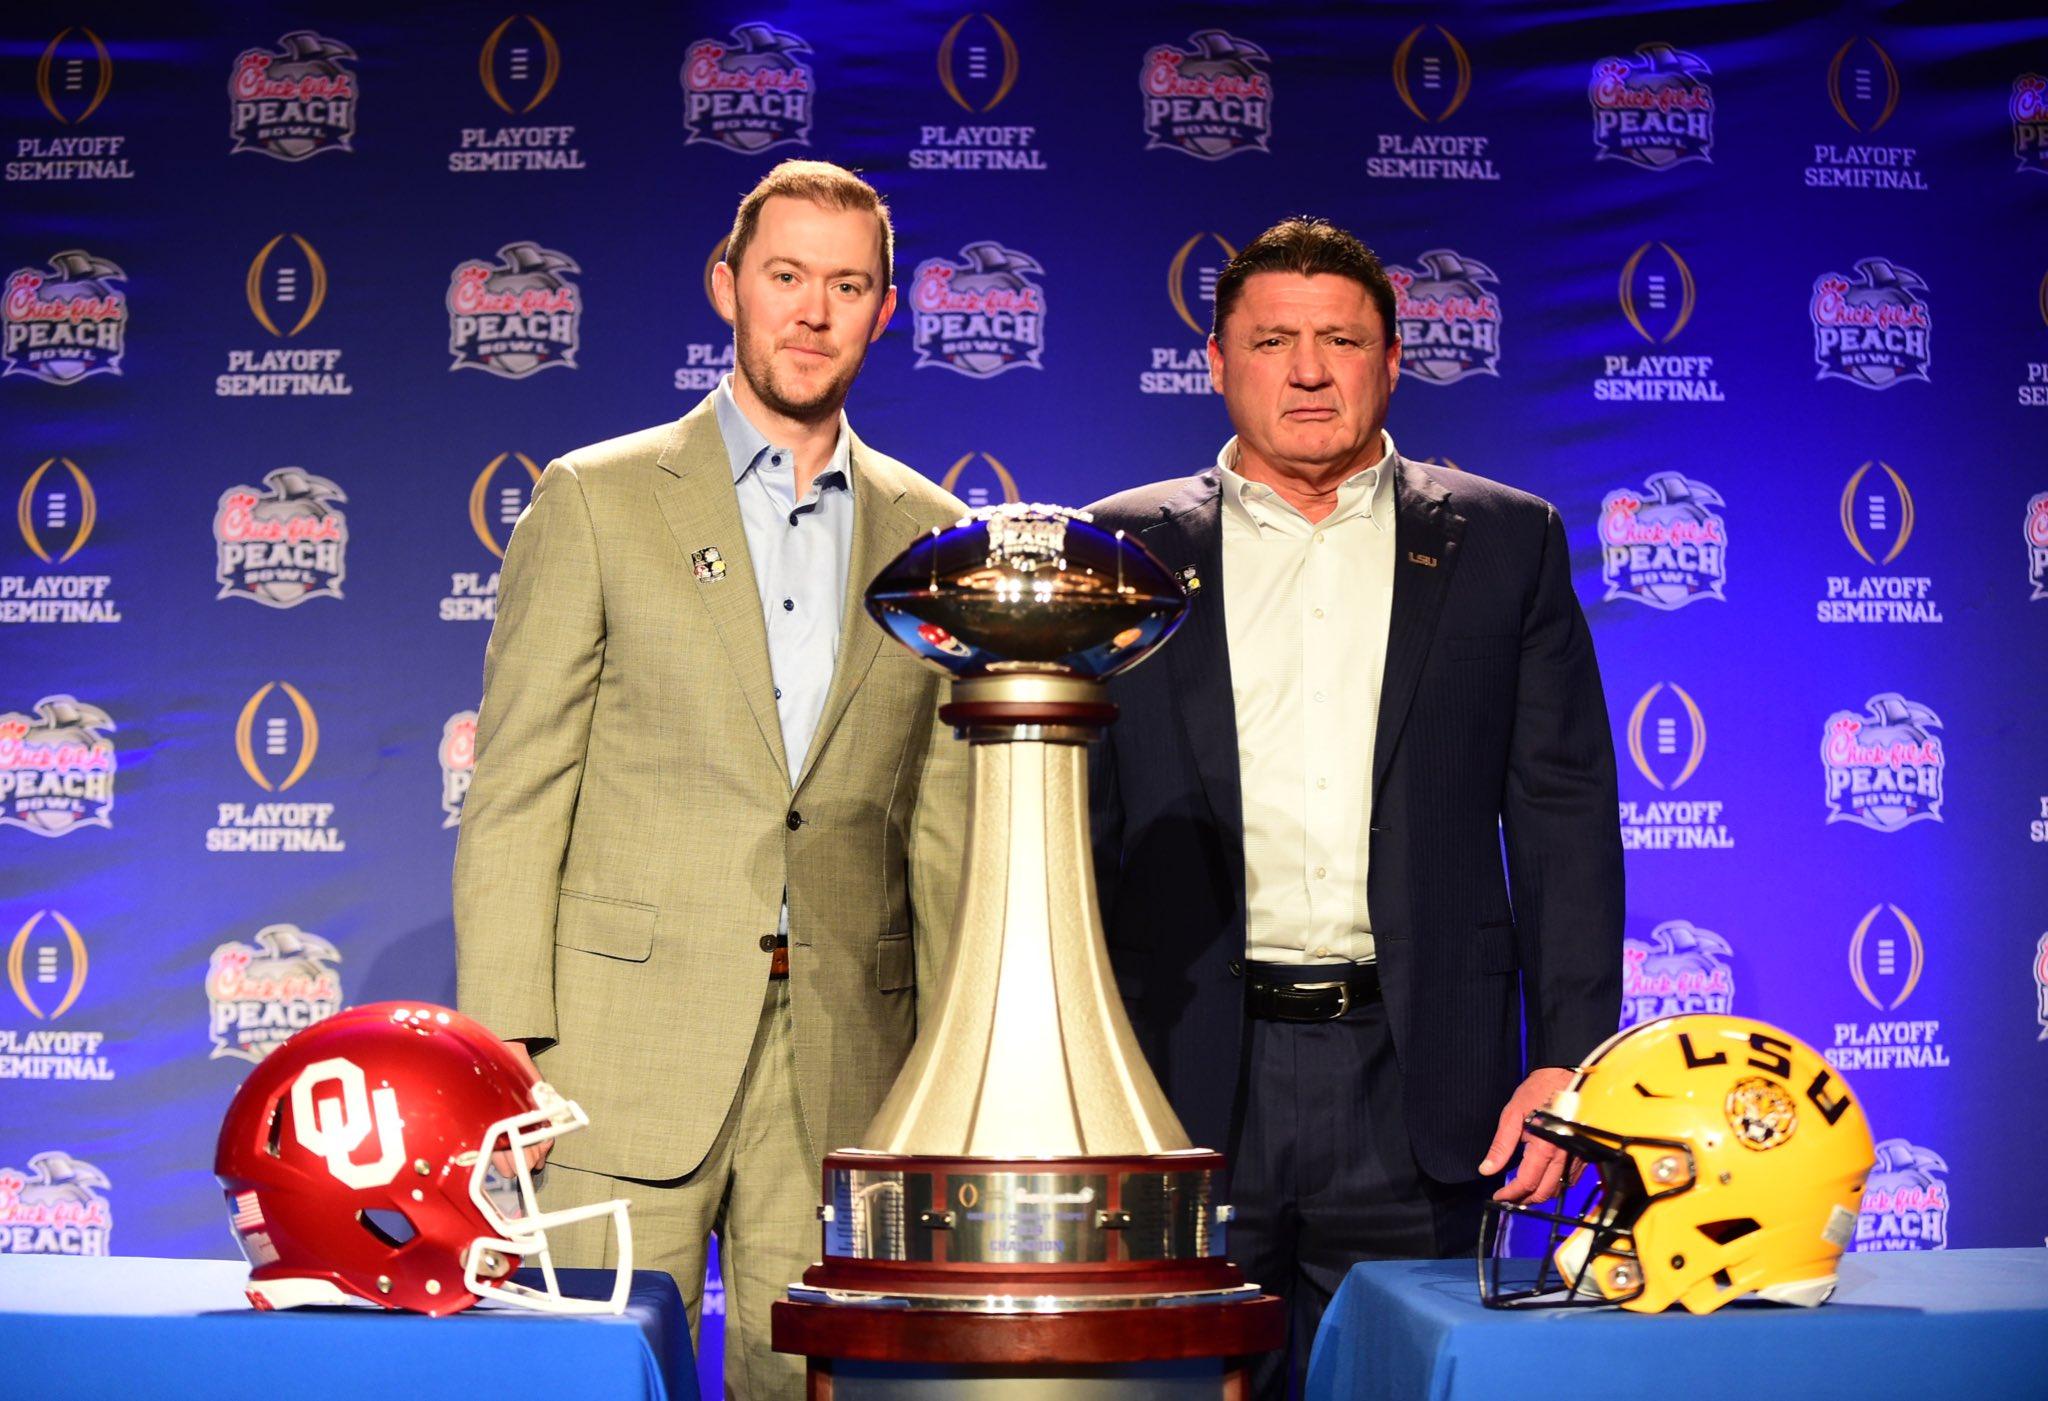 College Football Playoff: #4 Oklahoma vs #1 LSU Preview